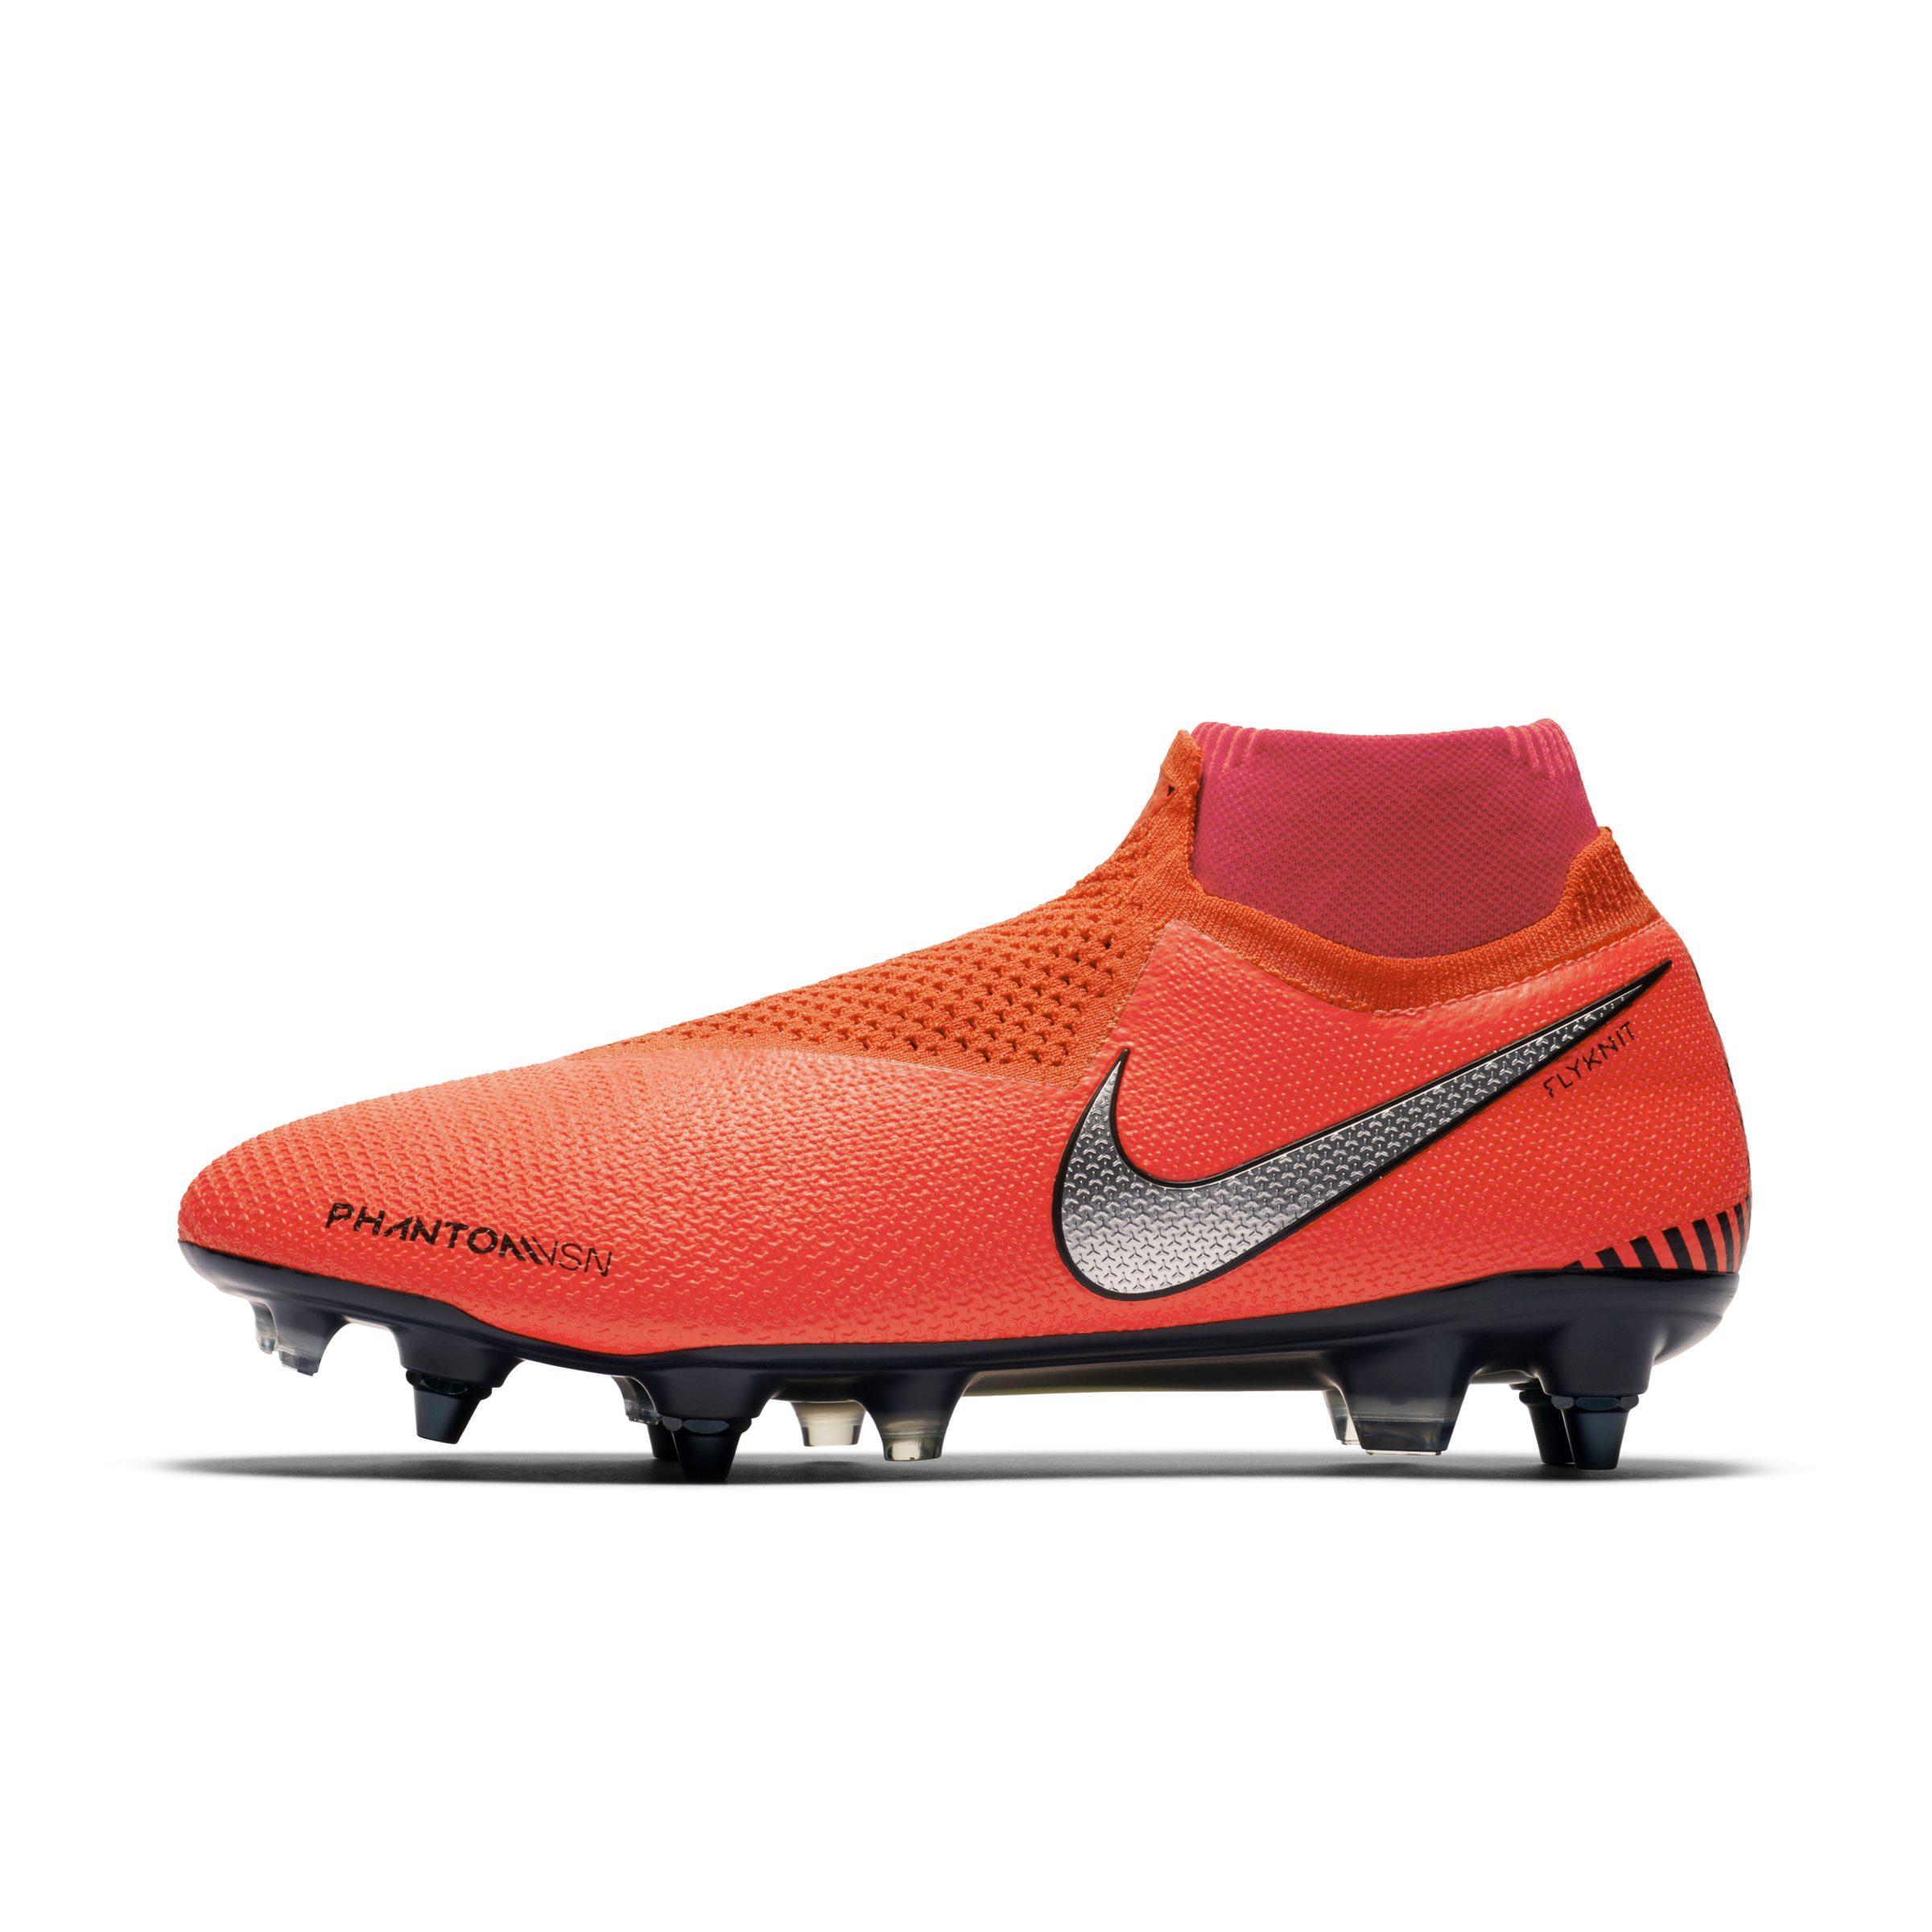 88a24ba82 Nike Phantom Vision Elite Dynamic Fit Anti-clog Sg-pro Football Boot ...